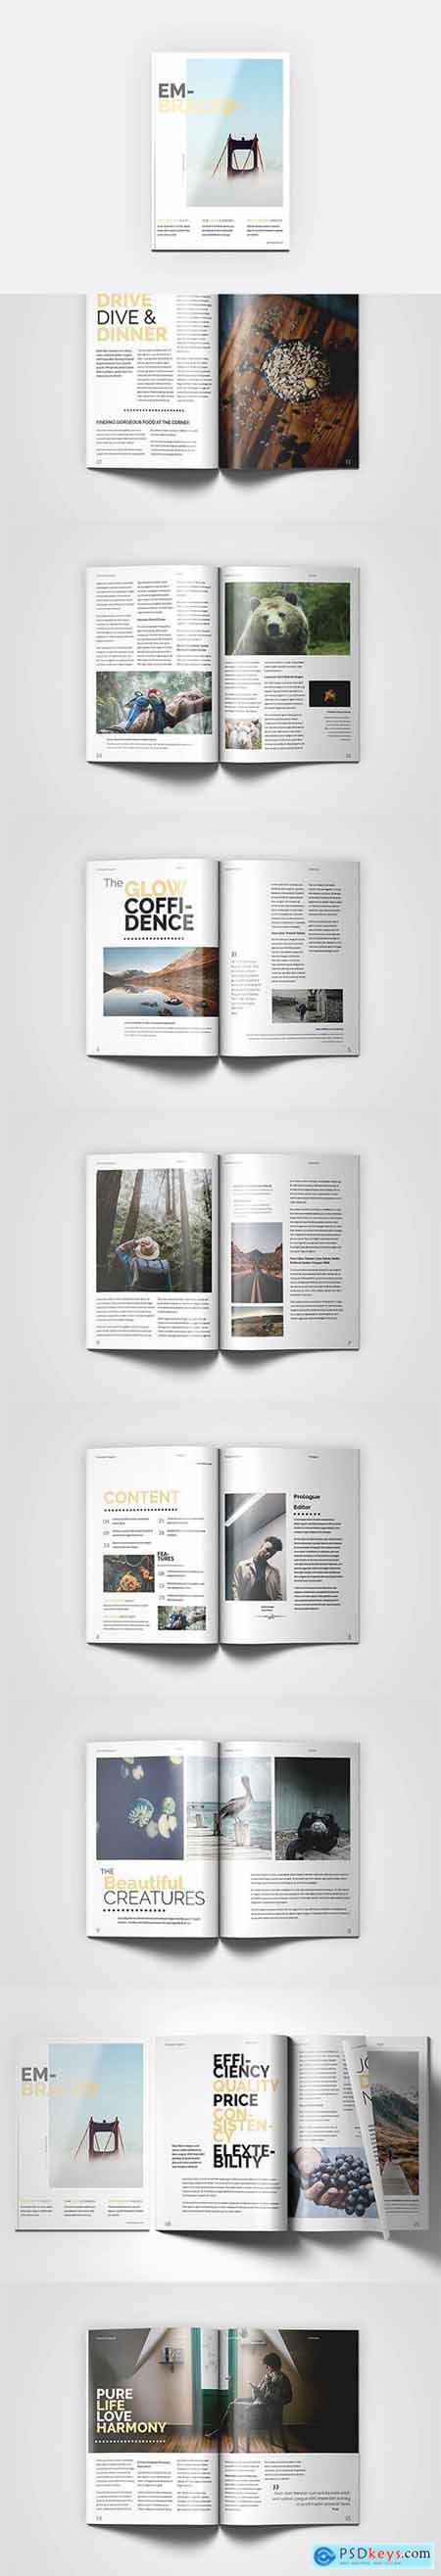 HQ - A4 Embraced Magazine V7